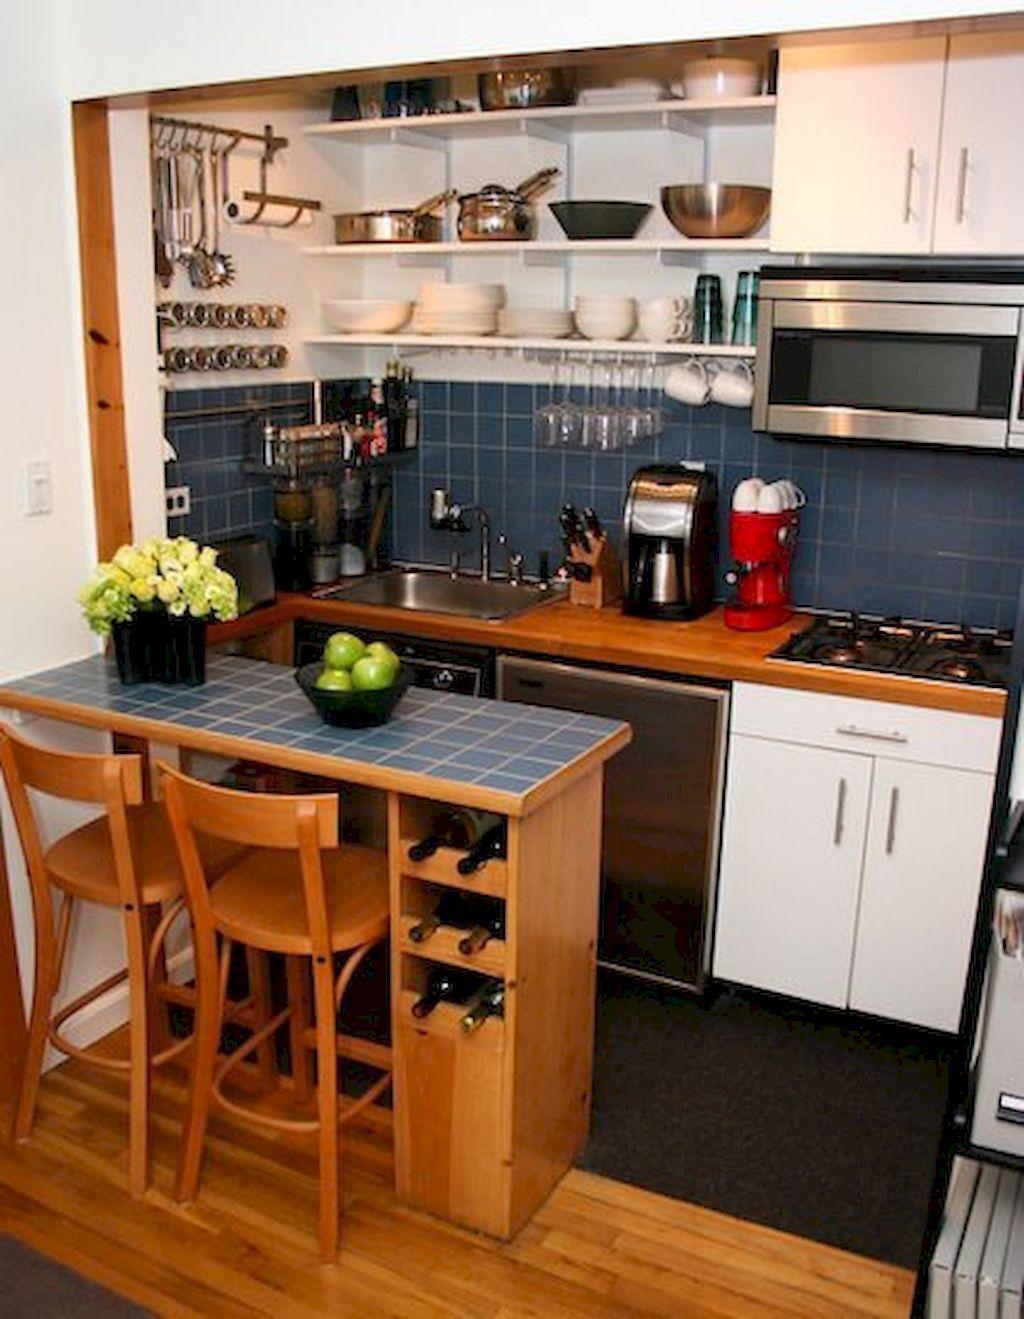 Genius tiny house kitchen ideas (30 | Pinterest